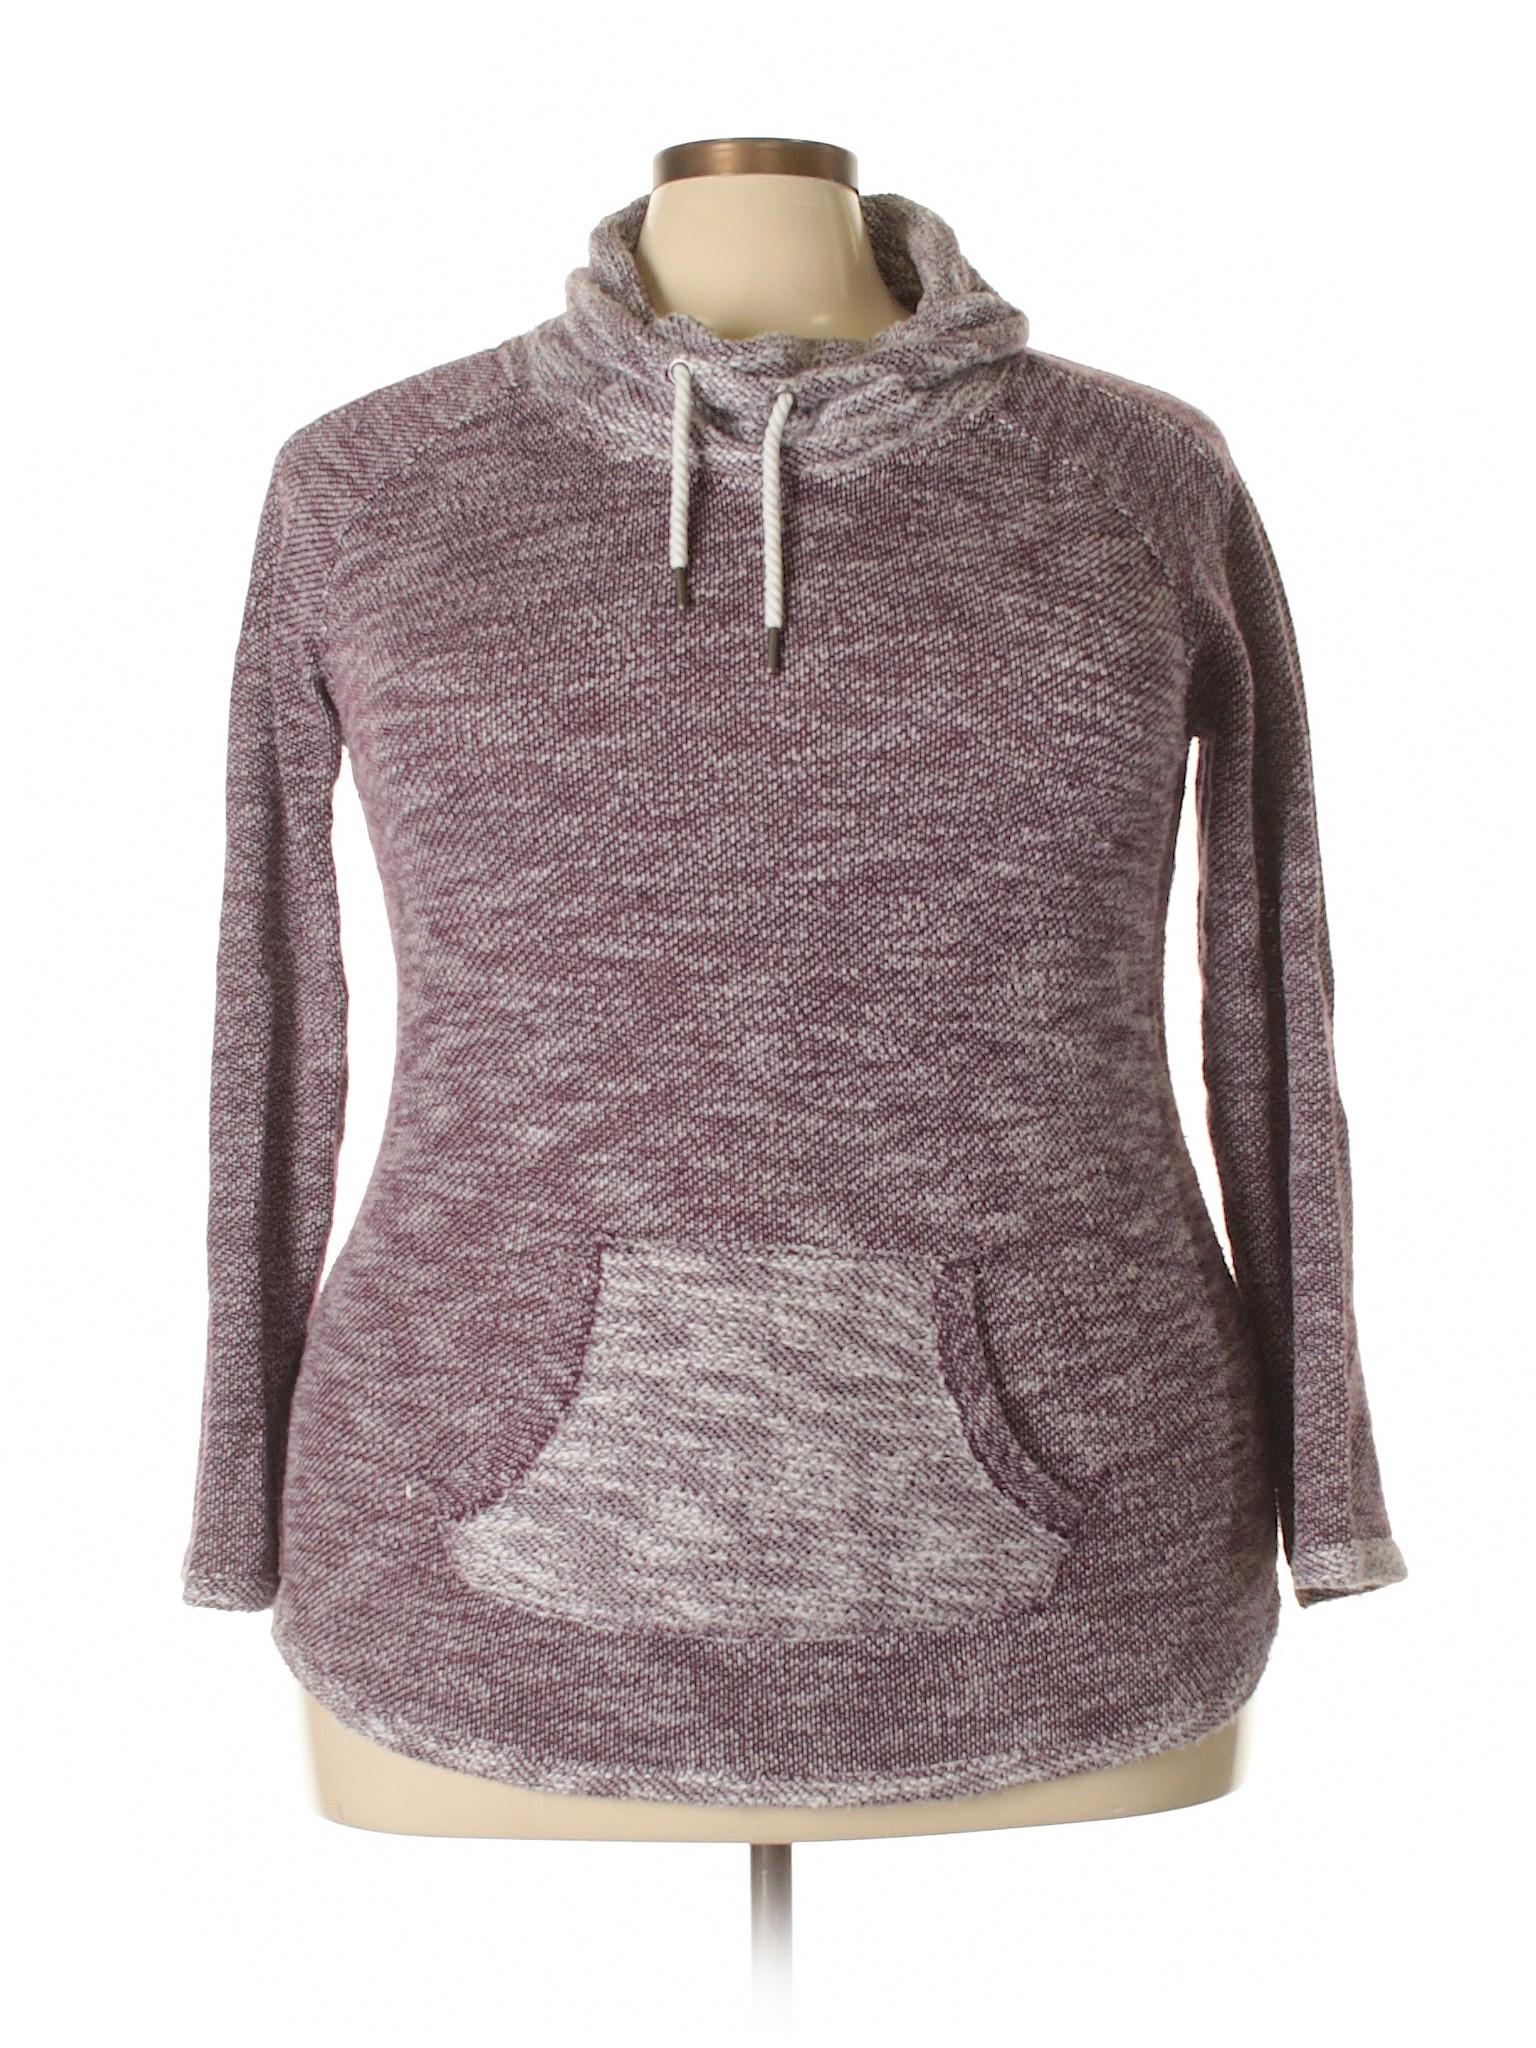 Boutique winter Sweater Kensie winter Pullover Boutique awWxafO